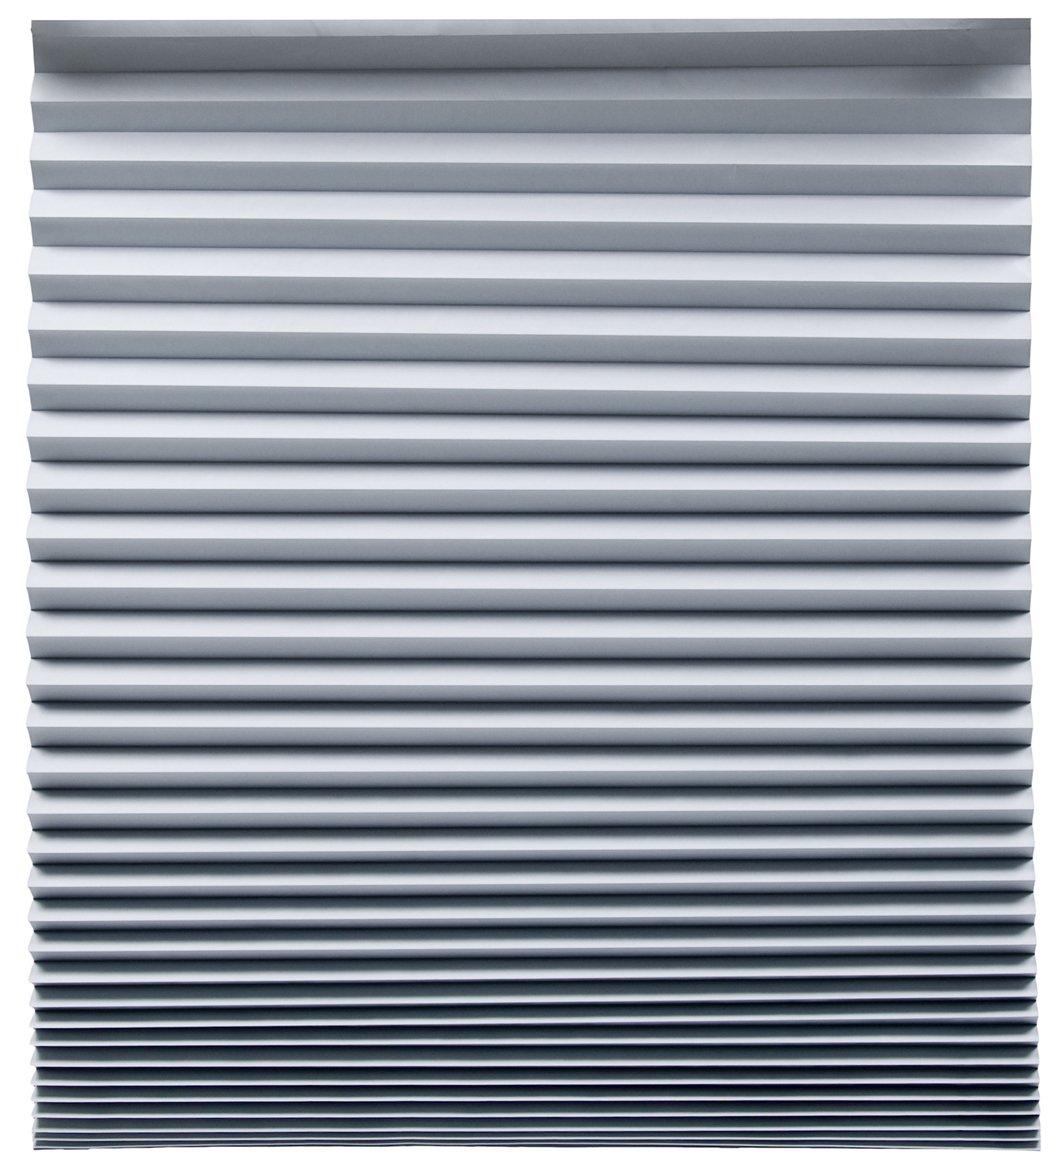 36x72 Fabric Window Shade Roll Up Porch Outdoor Sun Solar Deck Blind Exterior Ebay